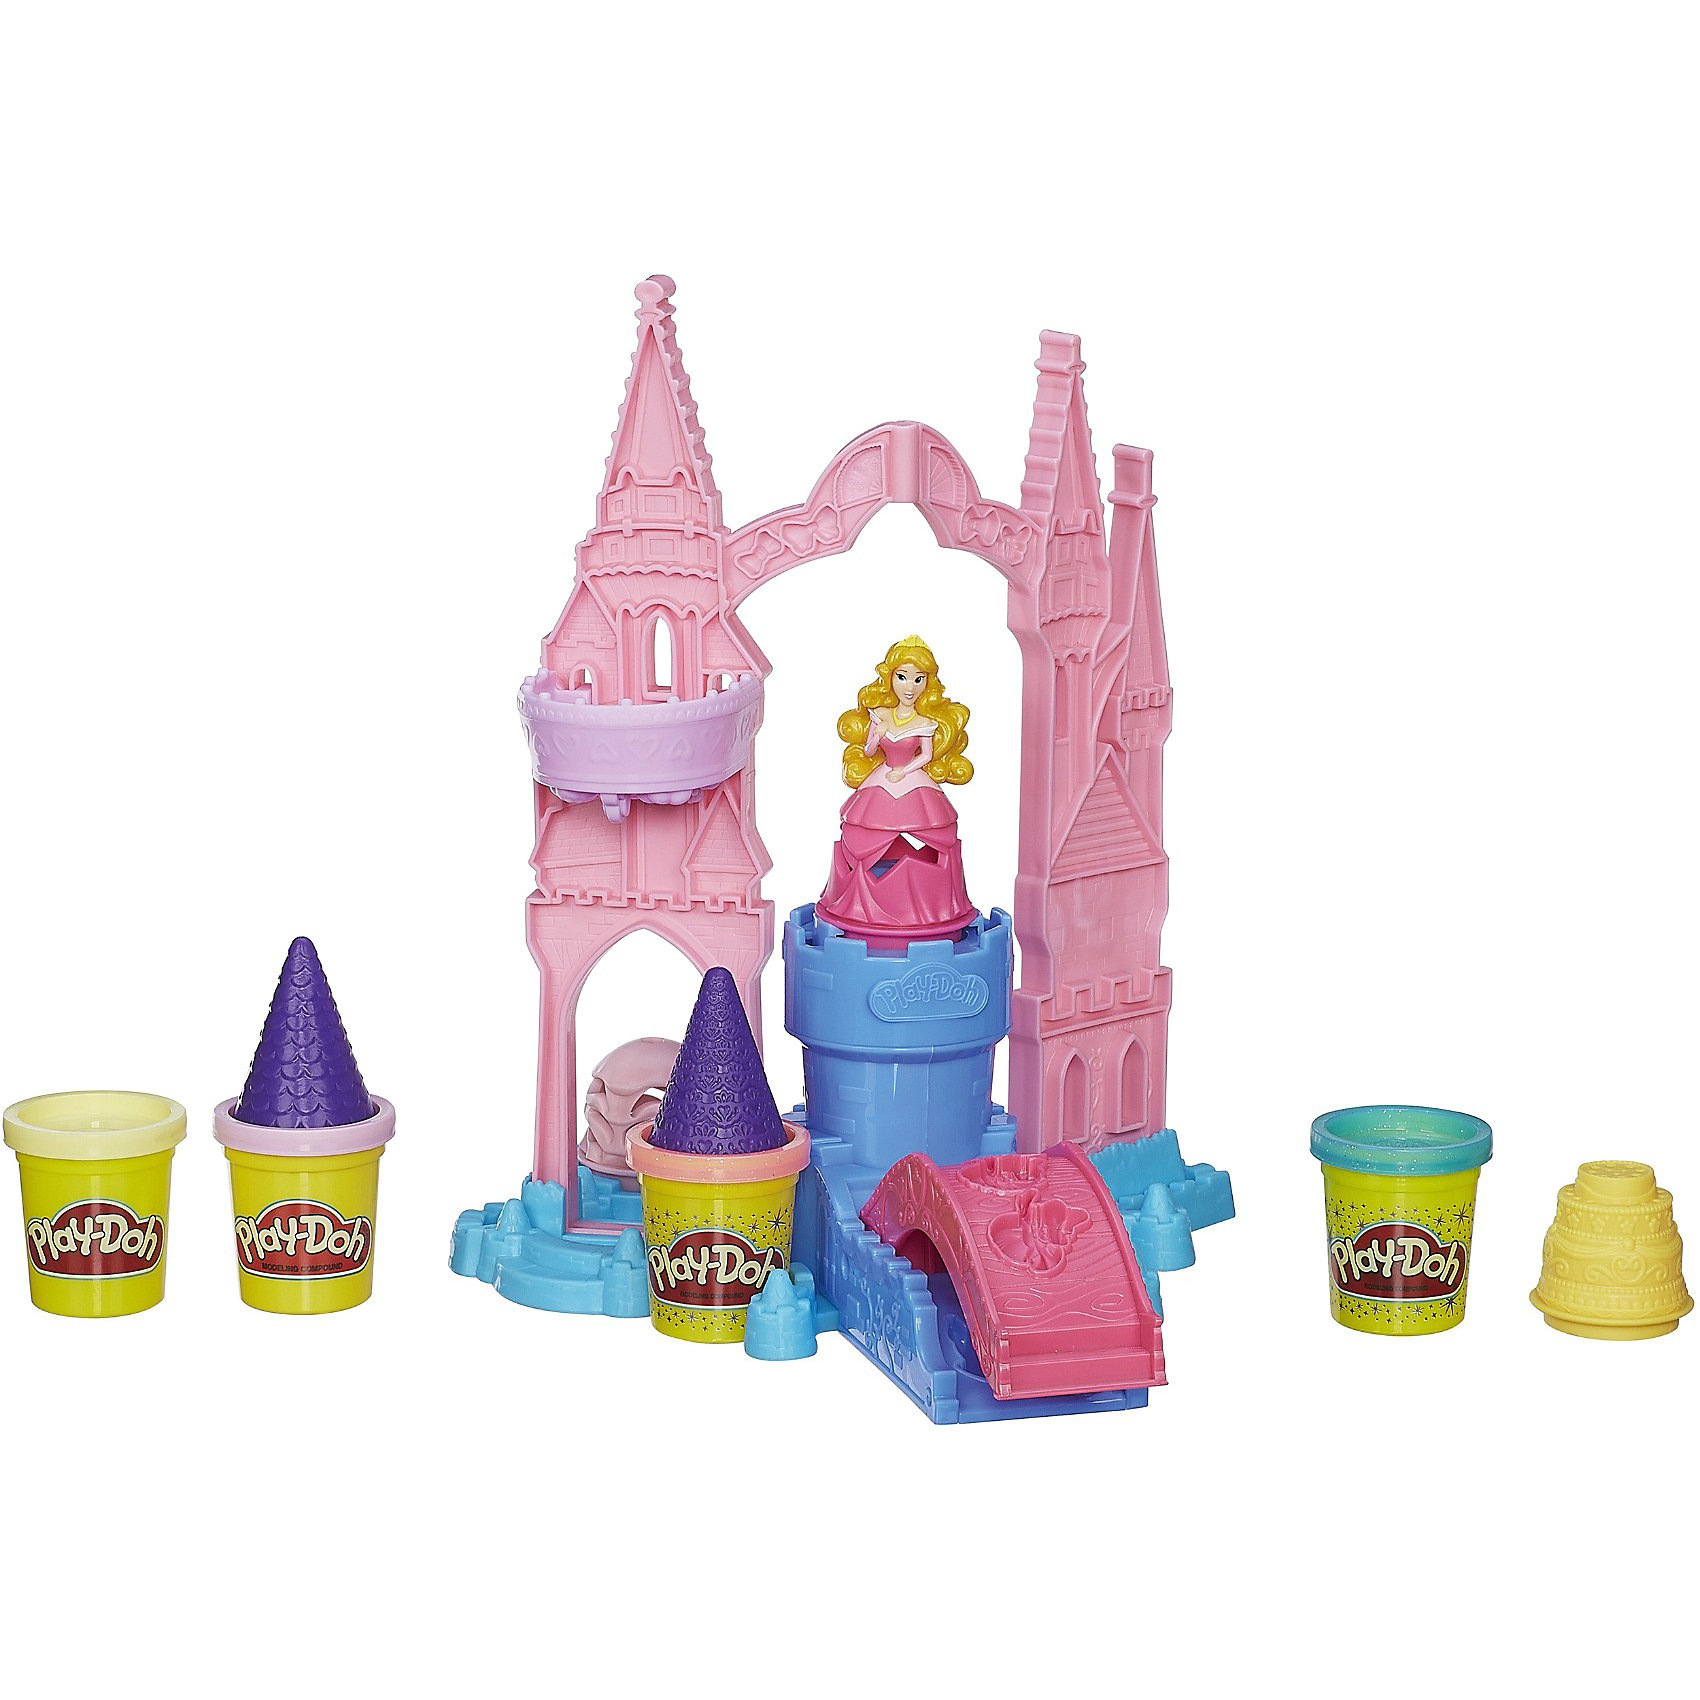 Hasbro Игровой набор Чудесный замок Авроры,Play-Doh hasbro play doh a6881 игровой набор пластилина чудесный замок авроры